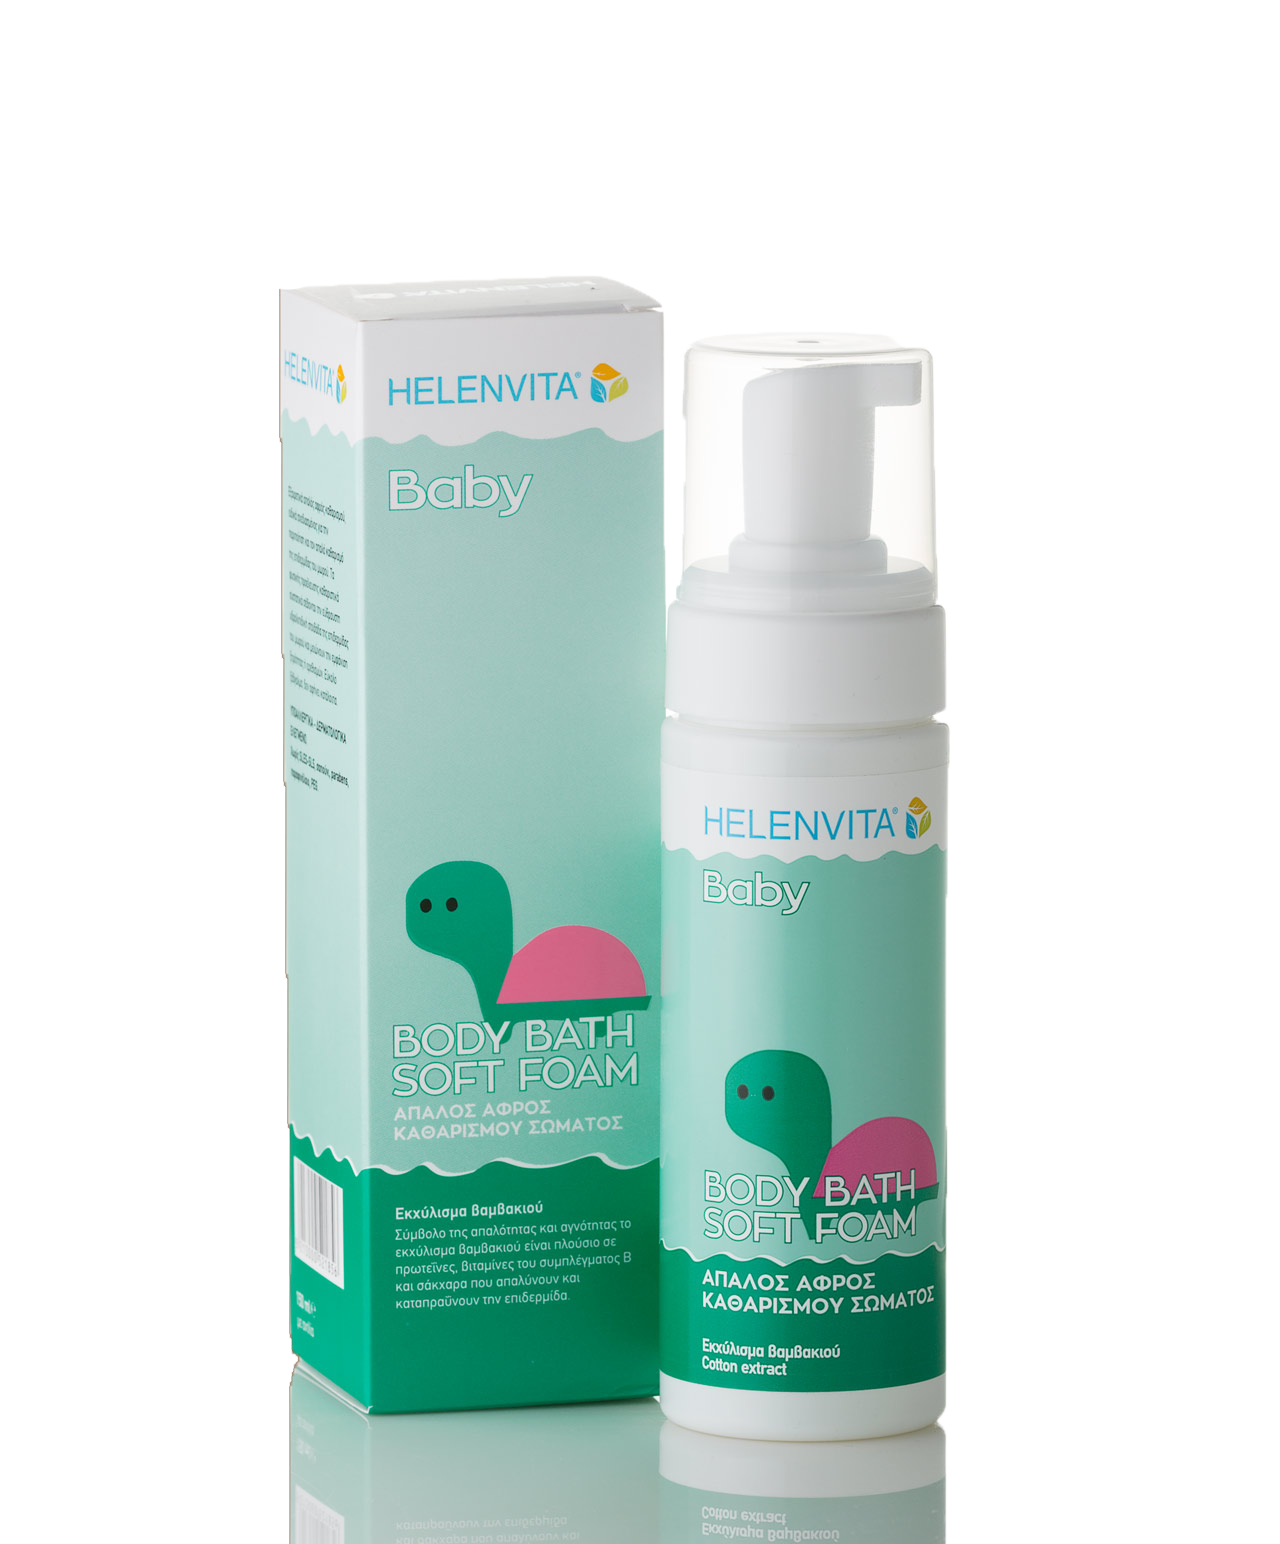 Helenvita Gentle Cleansing Foam 150ml